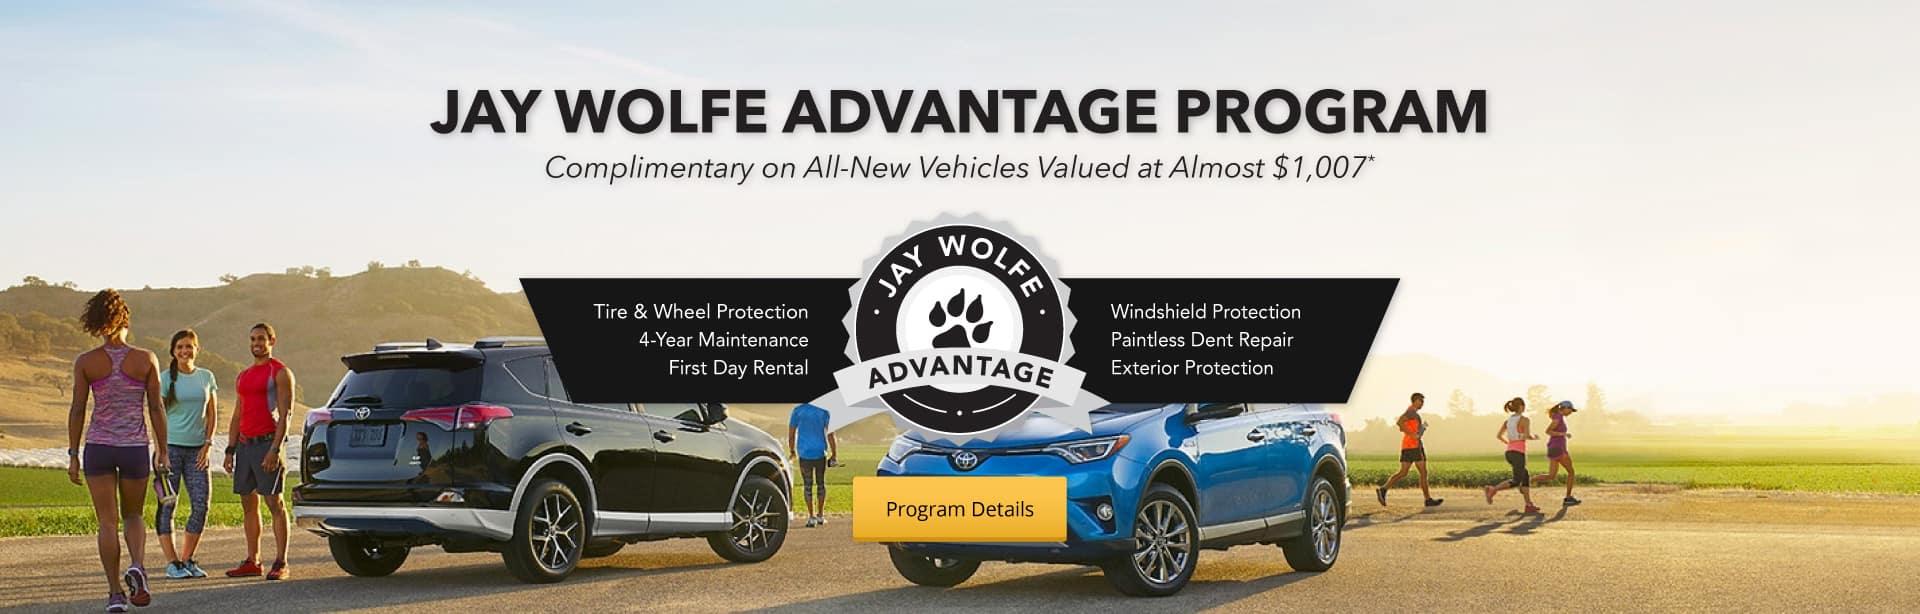 Jay Wolfe Advantage Program